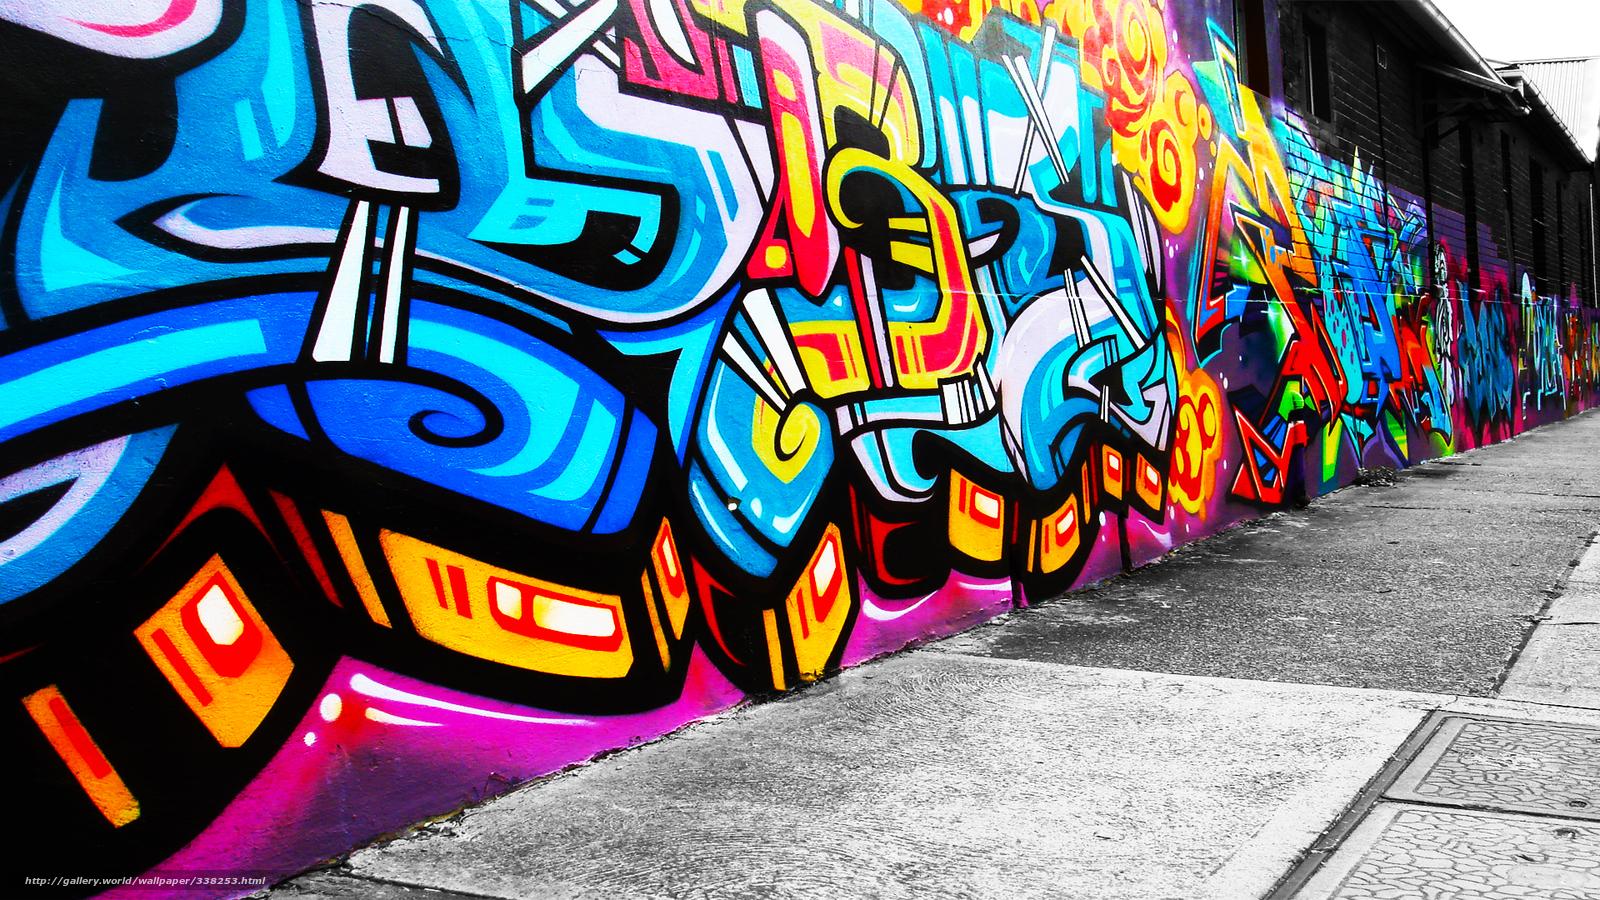 Tlcharger fond d 39 ecran style mur dessin peintures fonds for Fond ecran style